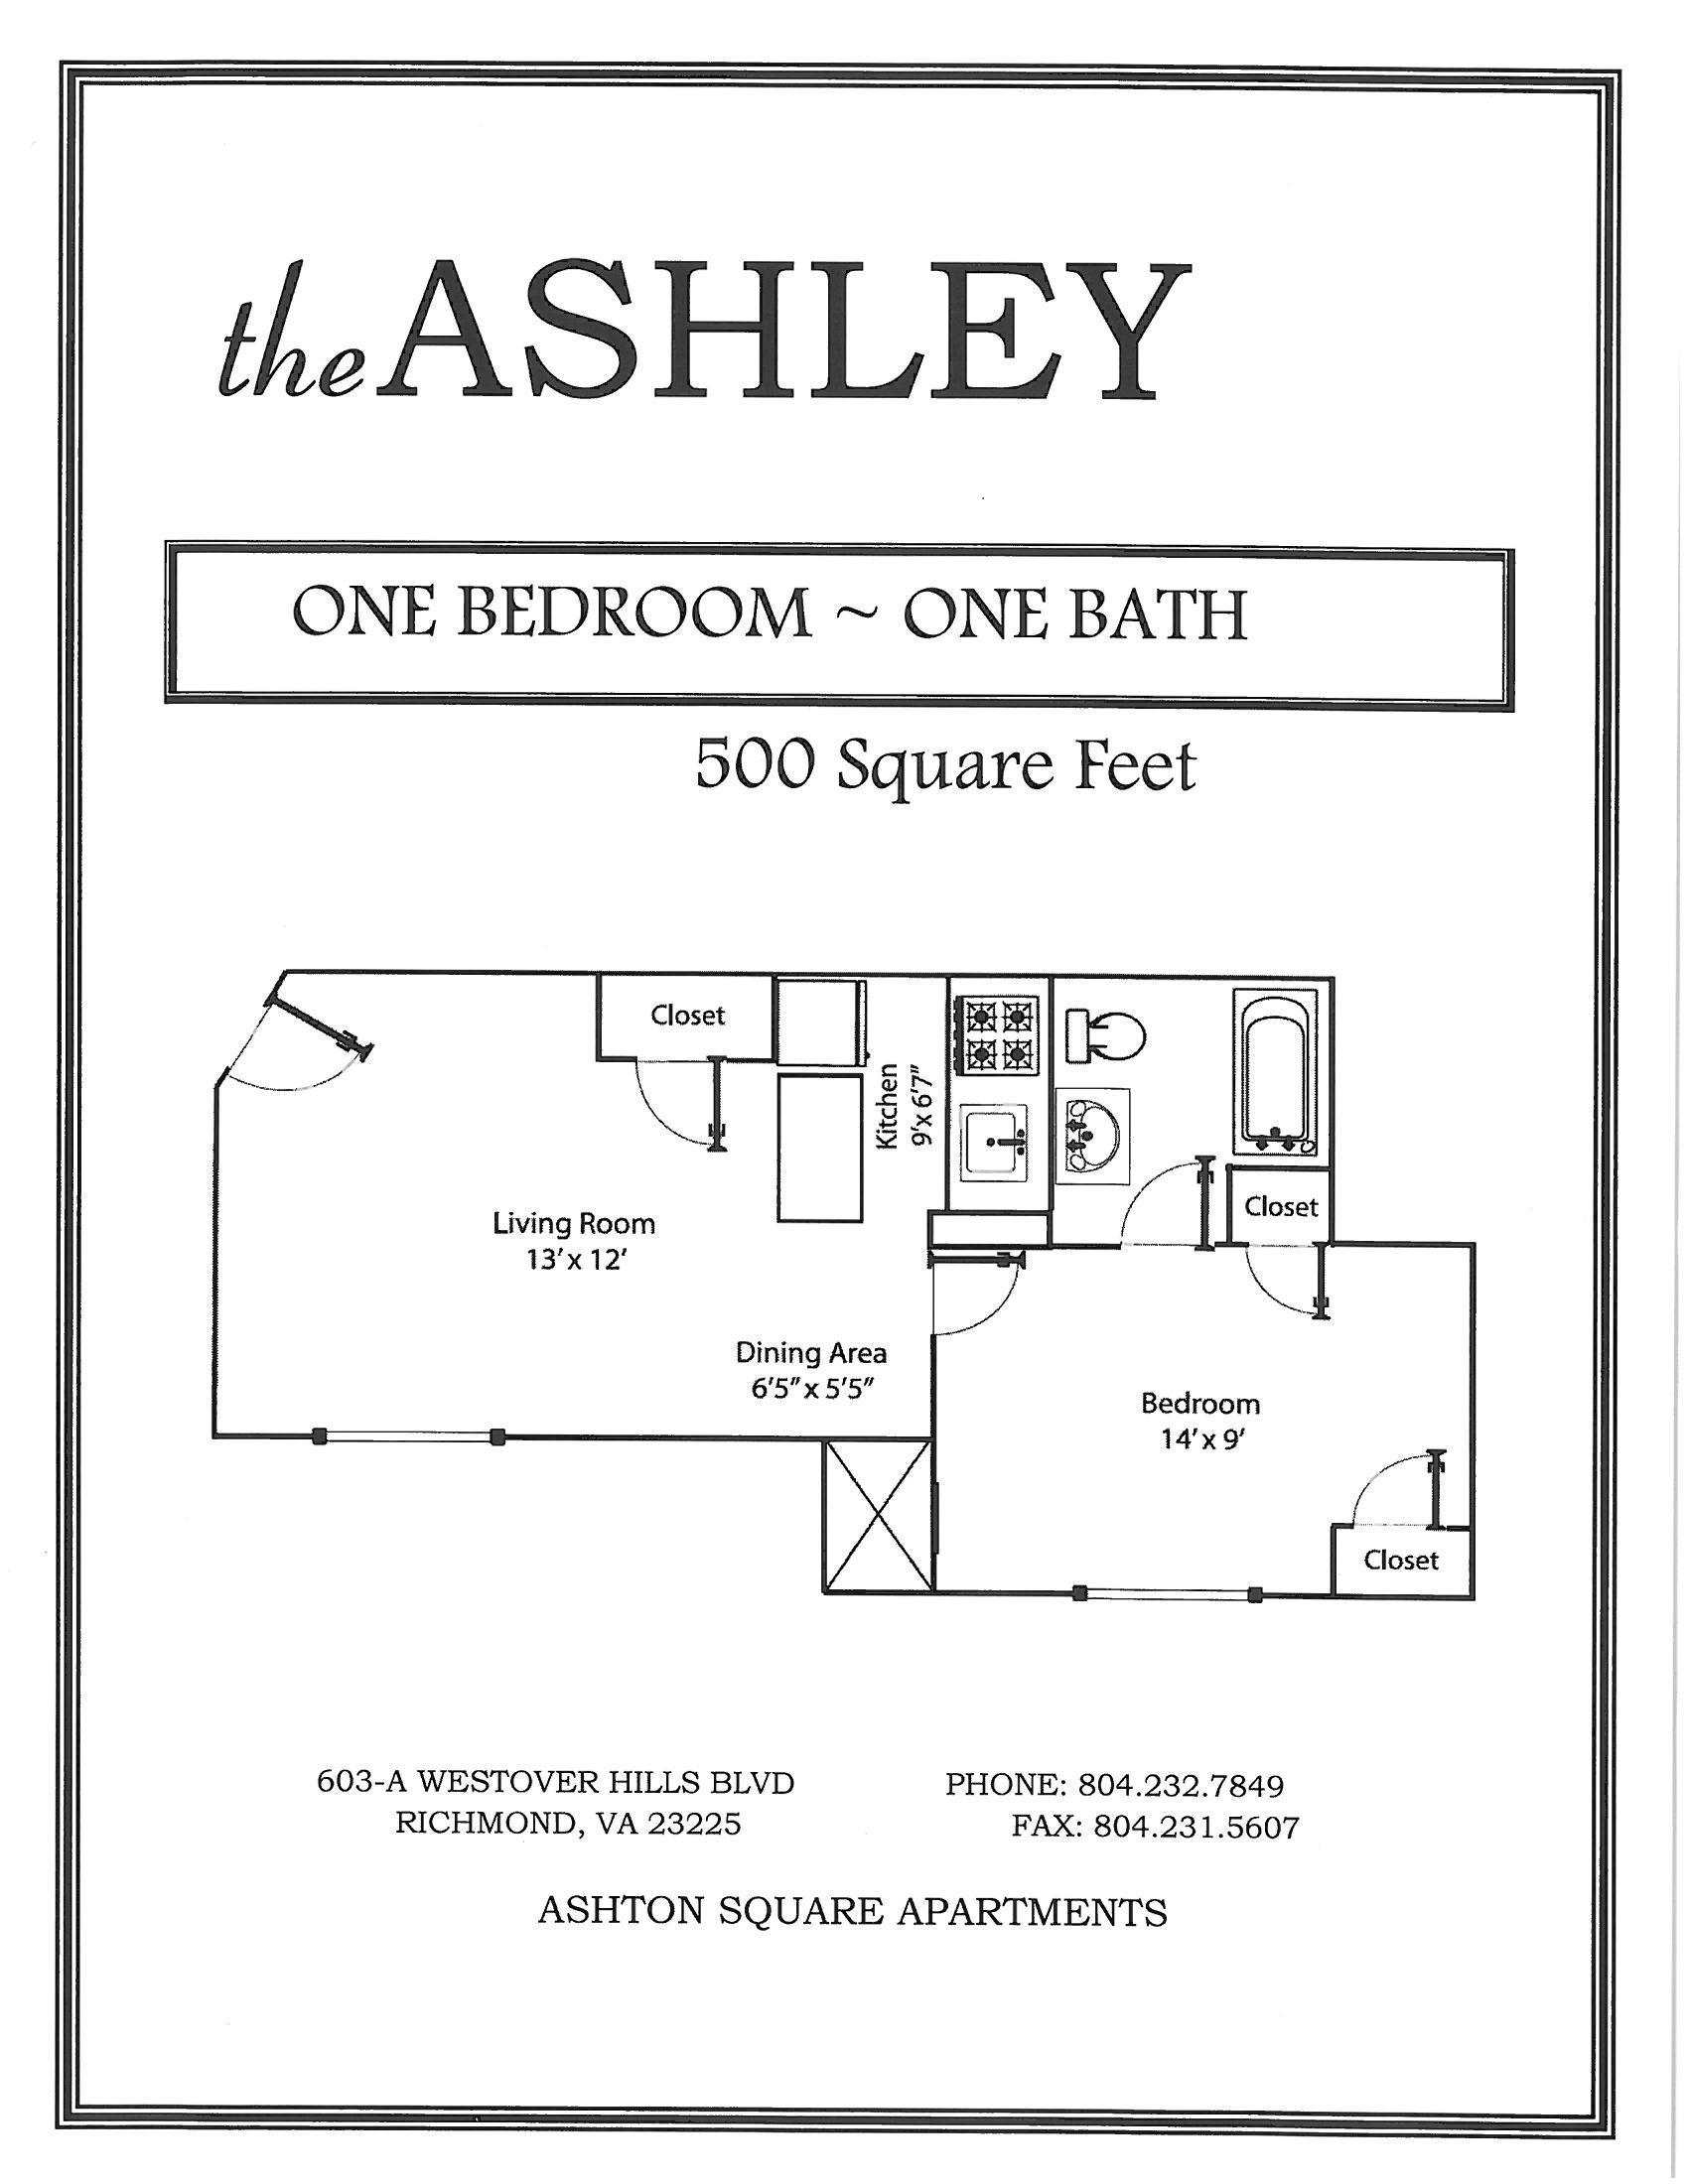 1 Bedroom 1 Bathroom Floor Plan at Ashton Square Apartments